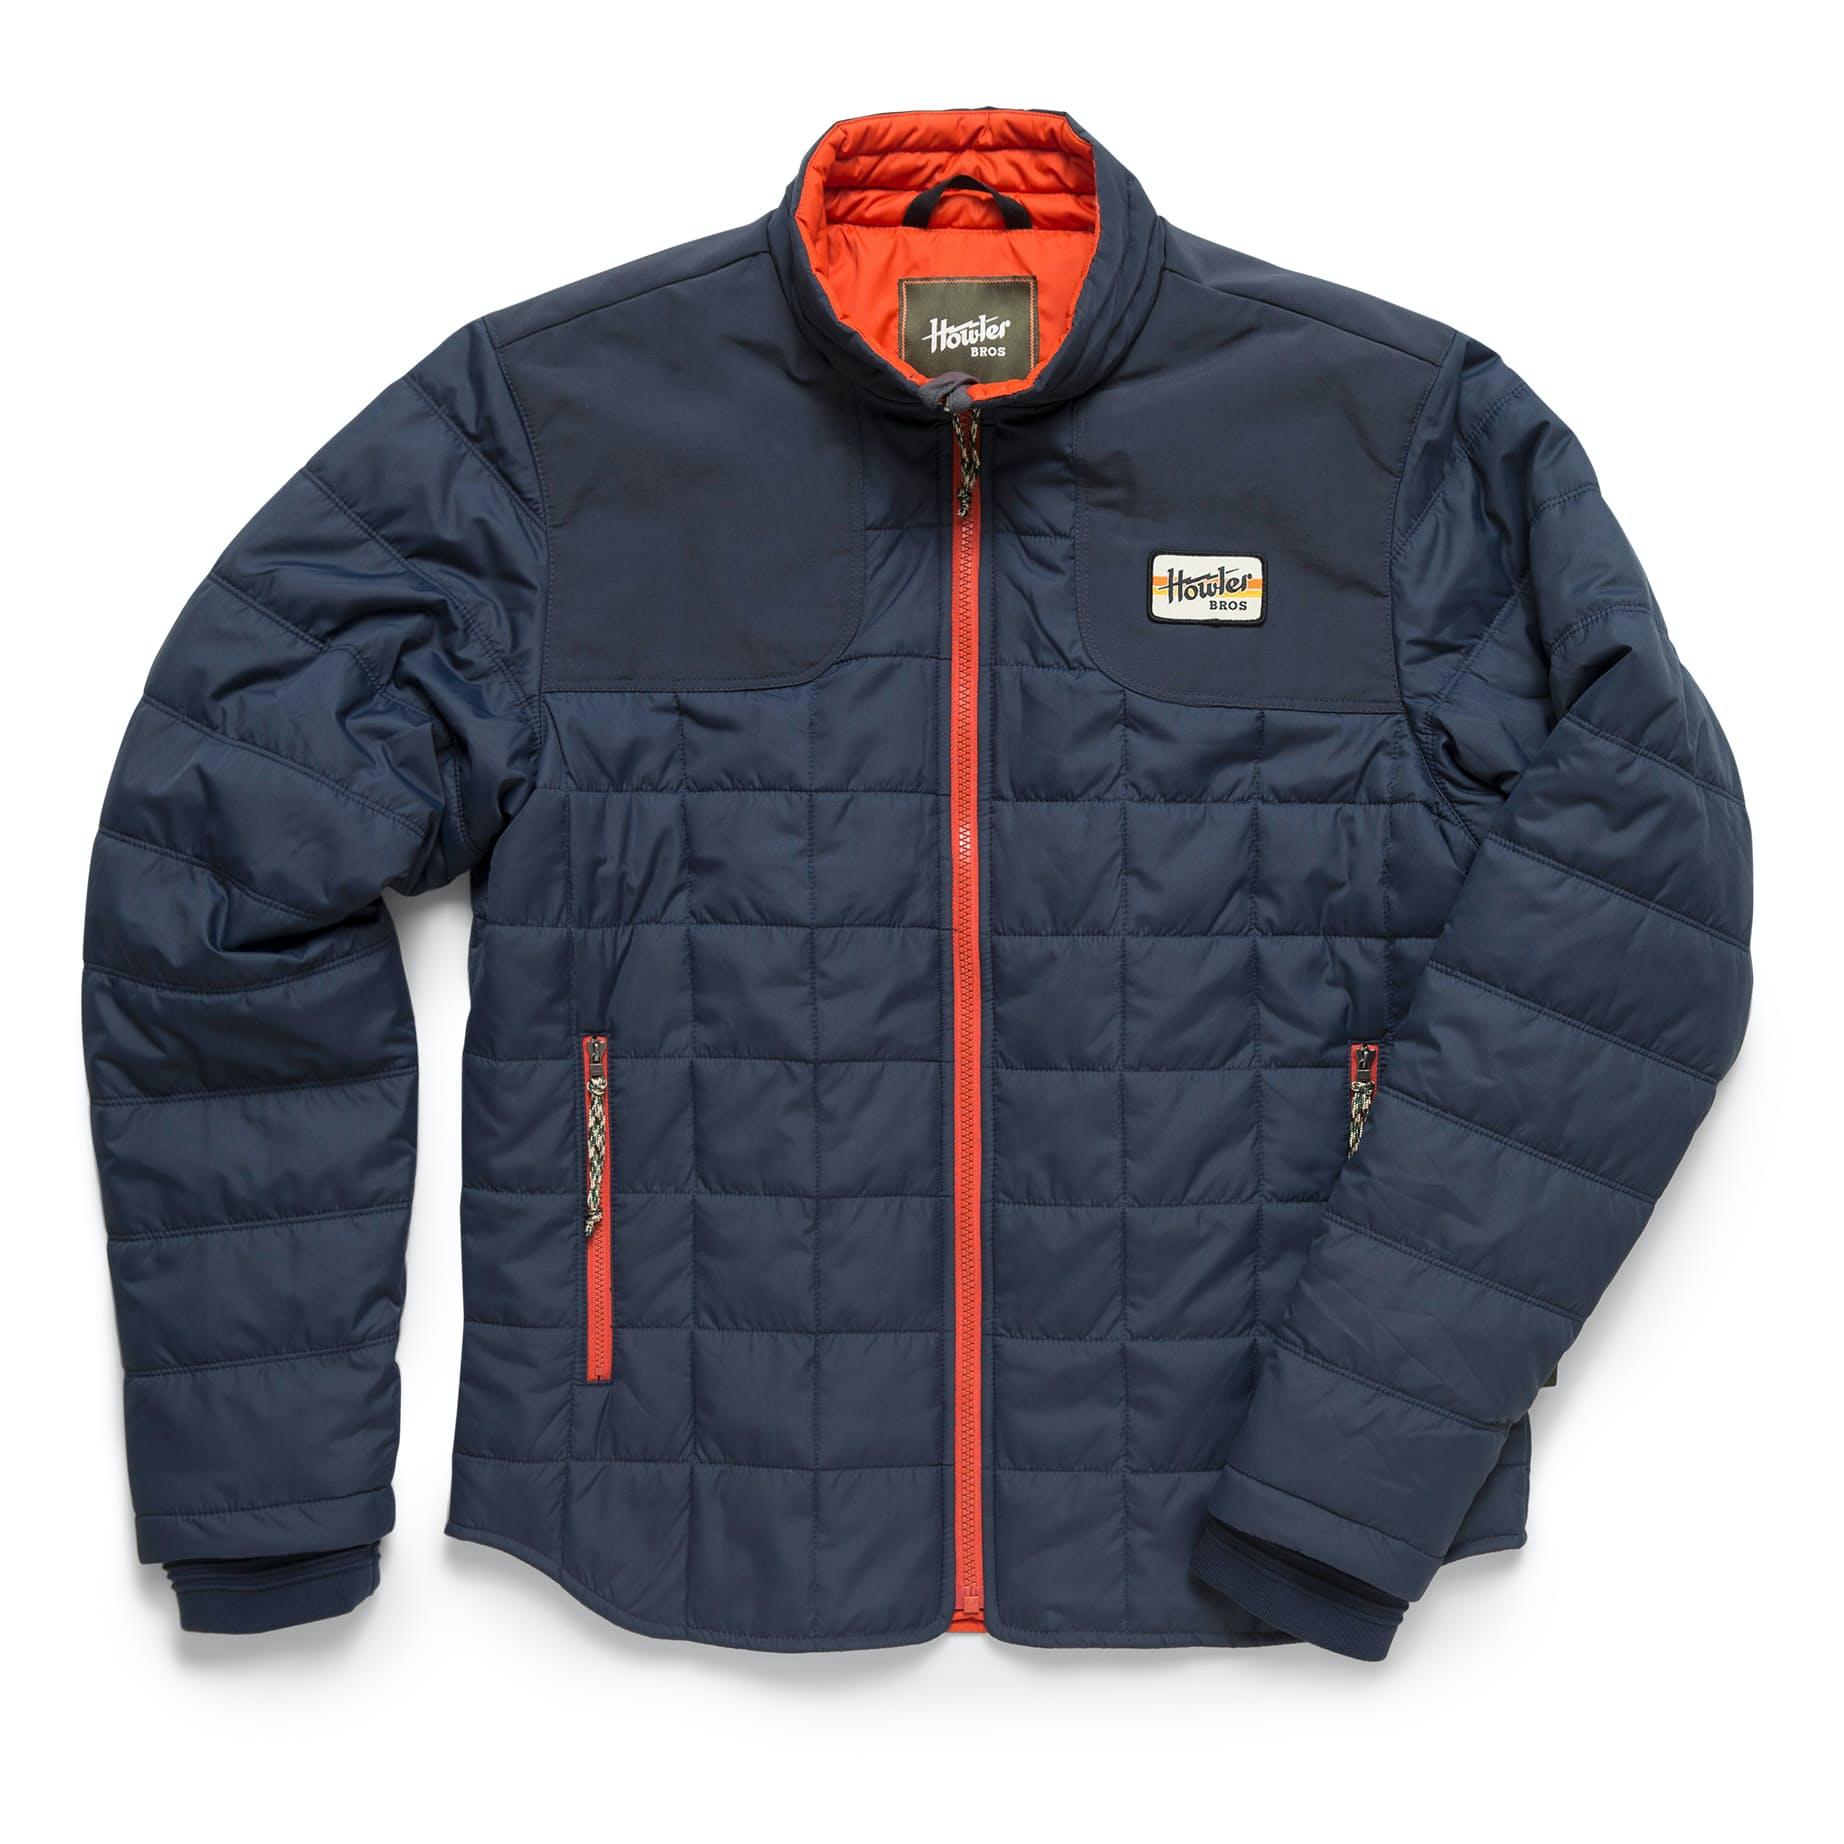 Kwdtol3xu7 howler brothers merlin jacket 0 original